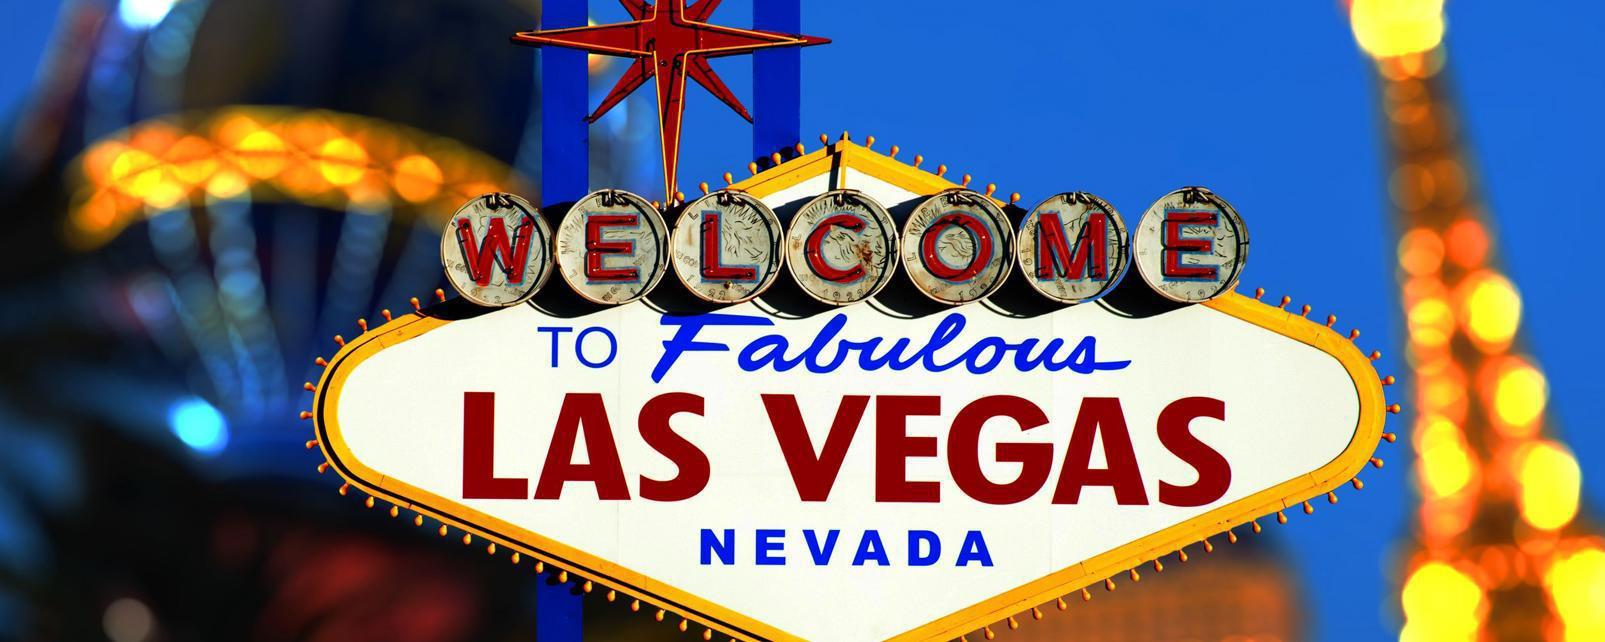 Image Usa Ville >> Las Vegas, préparer son voyage - Easyvoyage